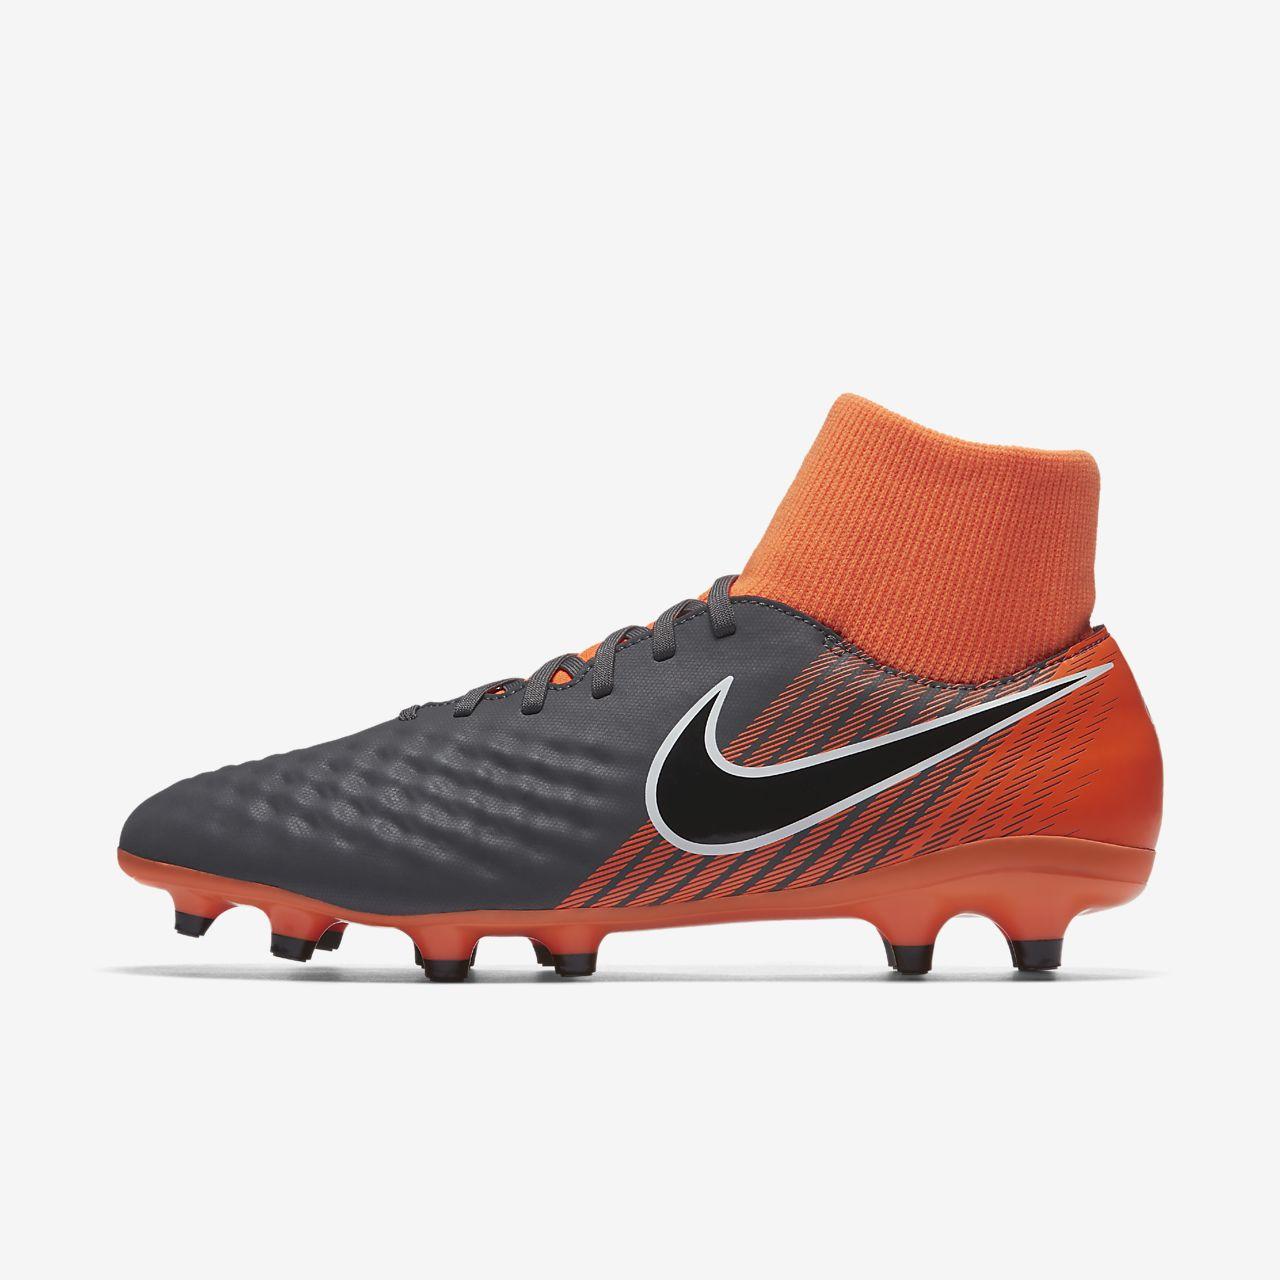 Nike Nike Magista Obra 2 Ajustement Pro Dynamique (fg) OBPXD2YF